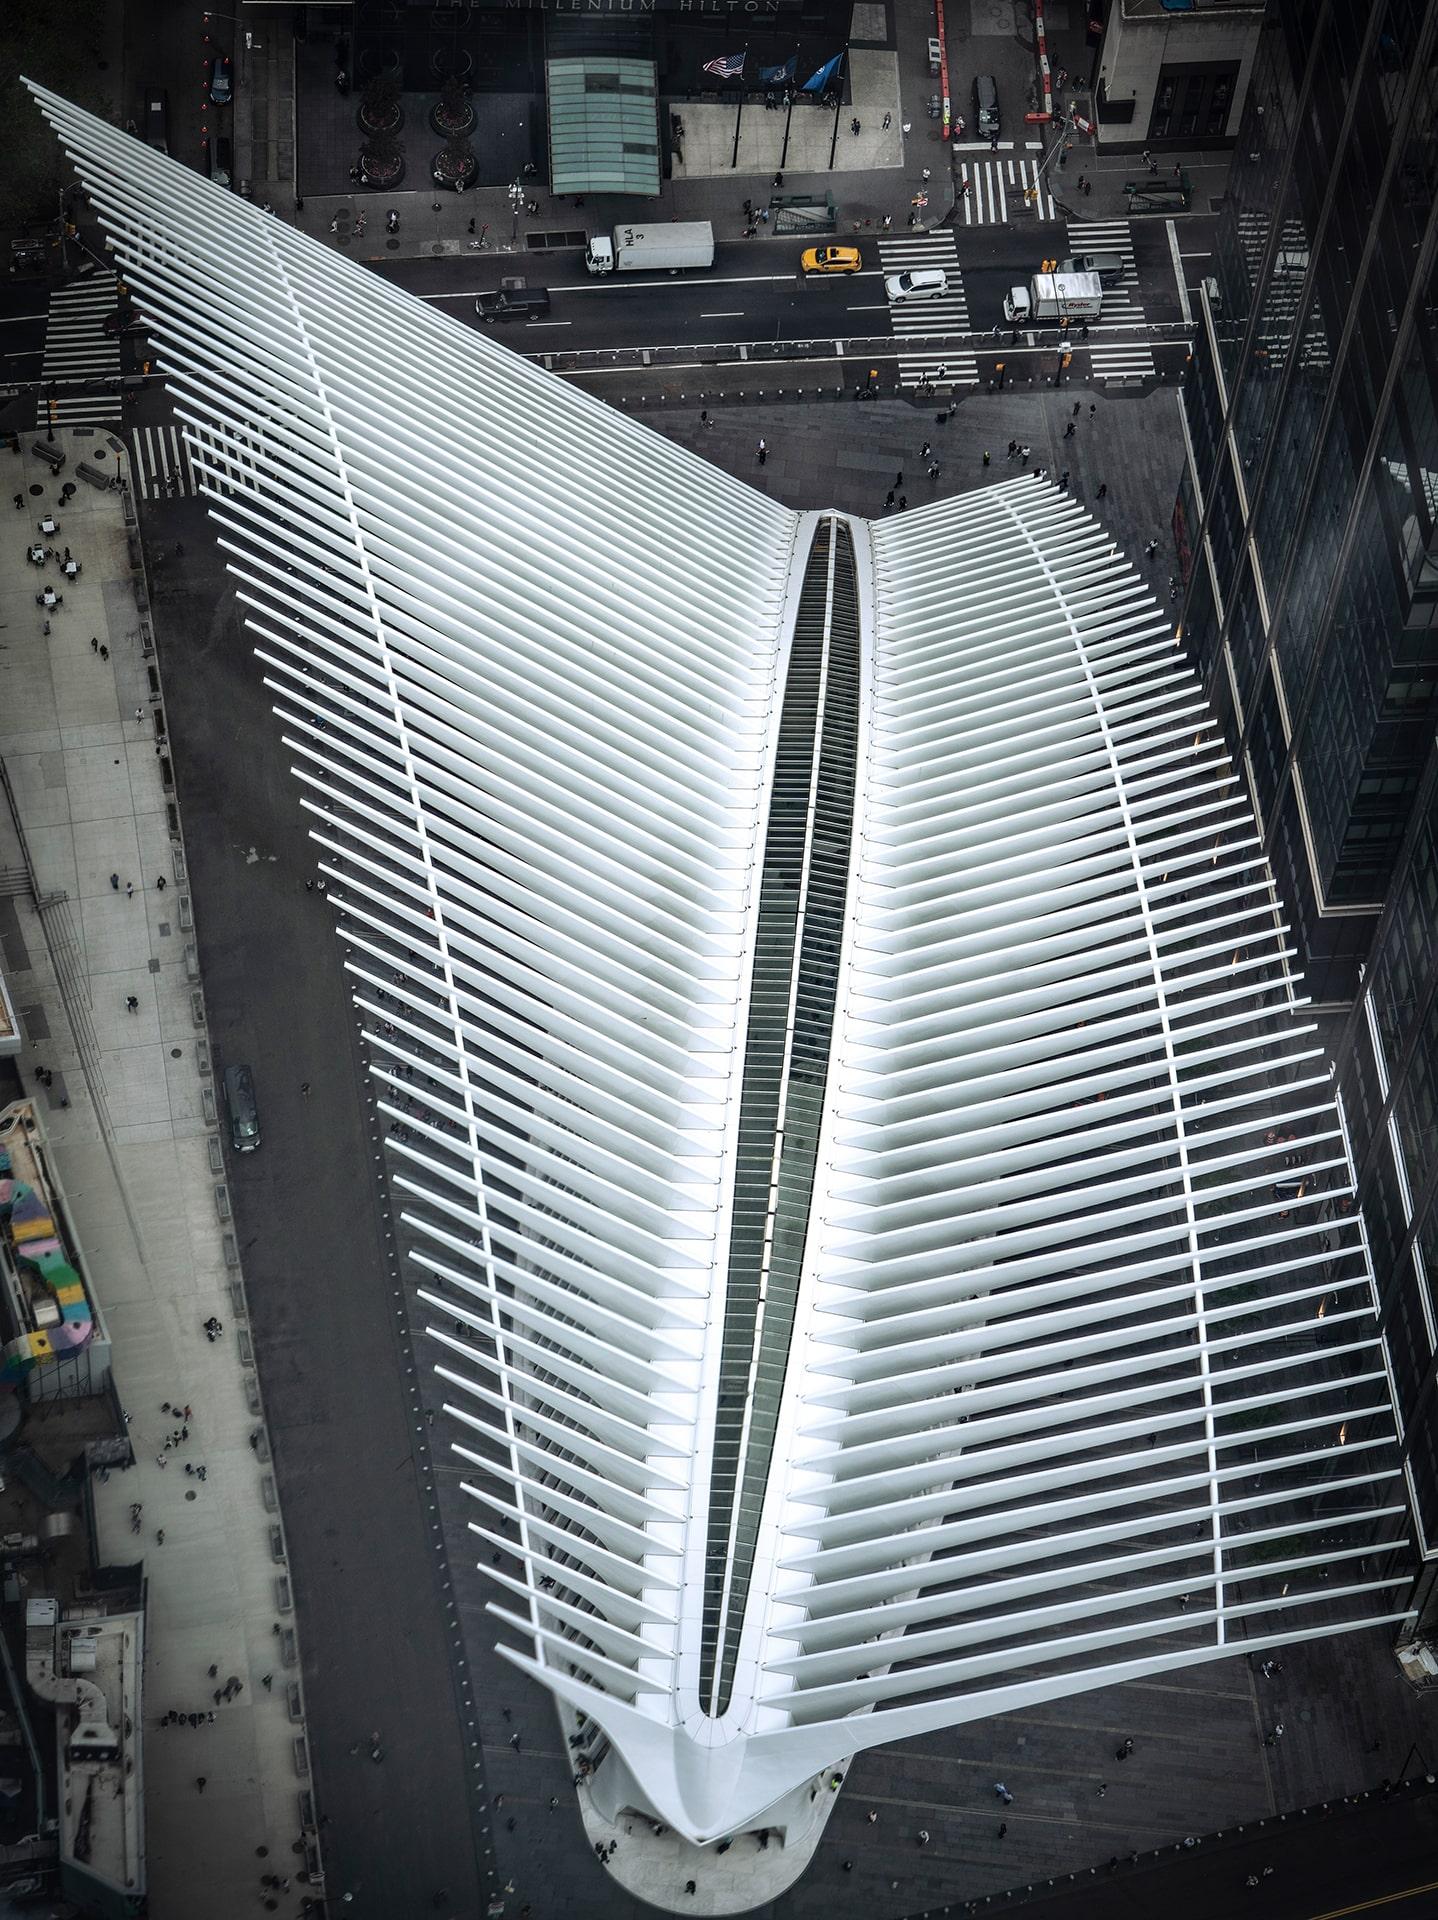 Blog Lifestyle - Gare The Oculus à Ground Zero, New York - Suivre sa Joie - Saskia Parein